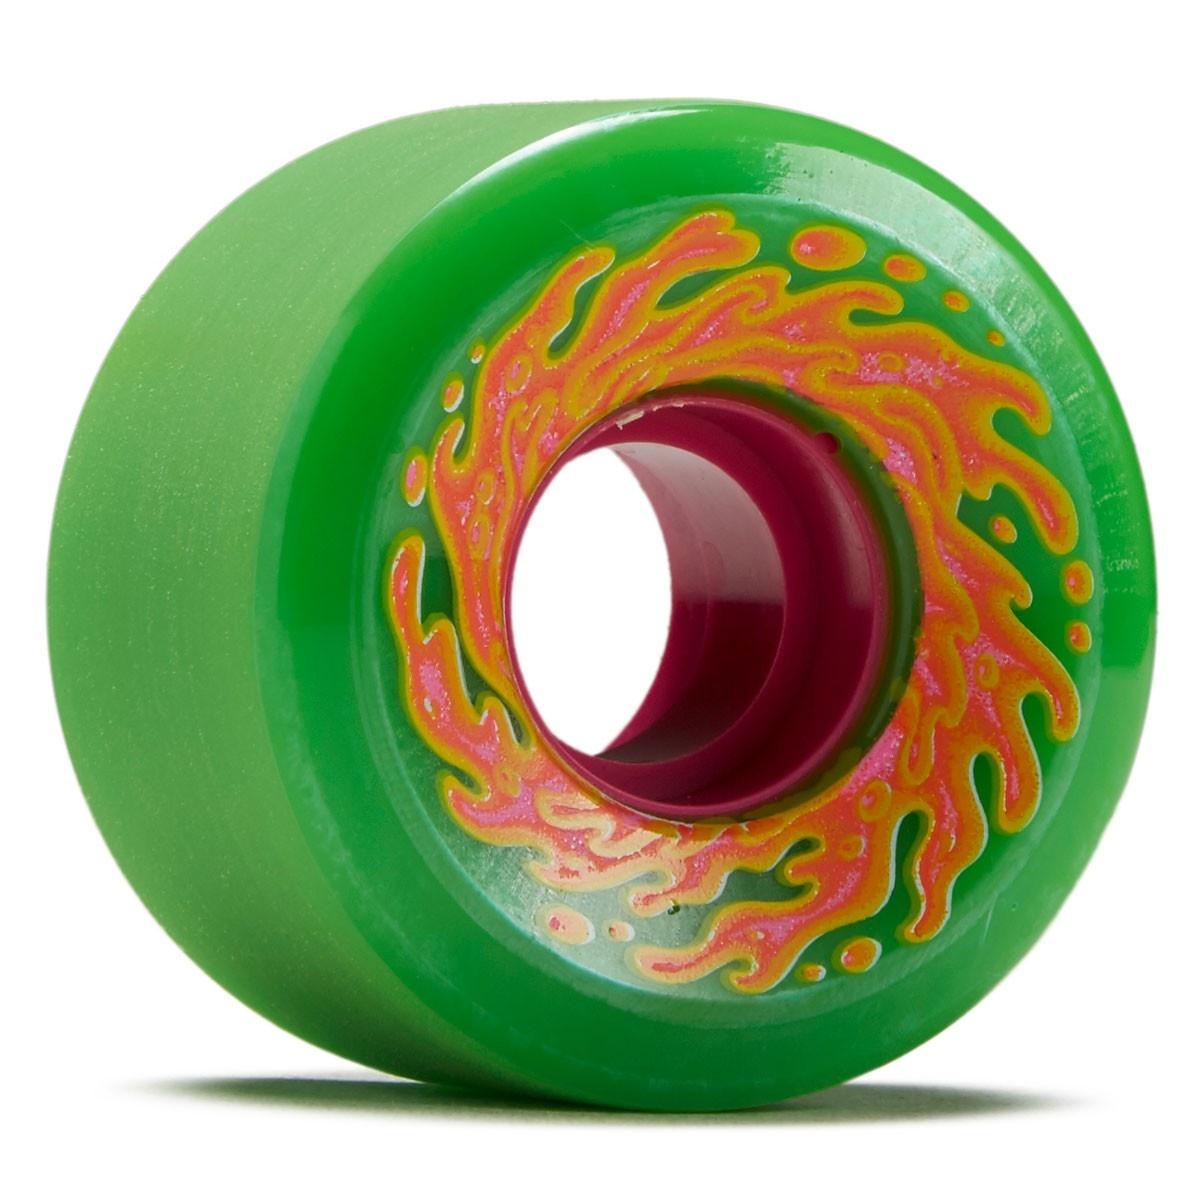 slime balls 54.5mm mini og slime green pink 78a wheels